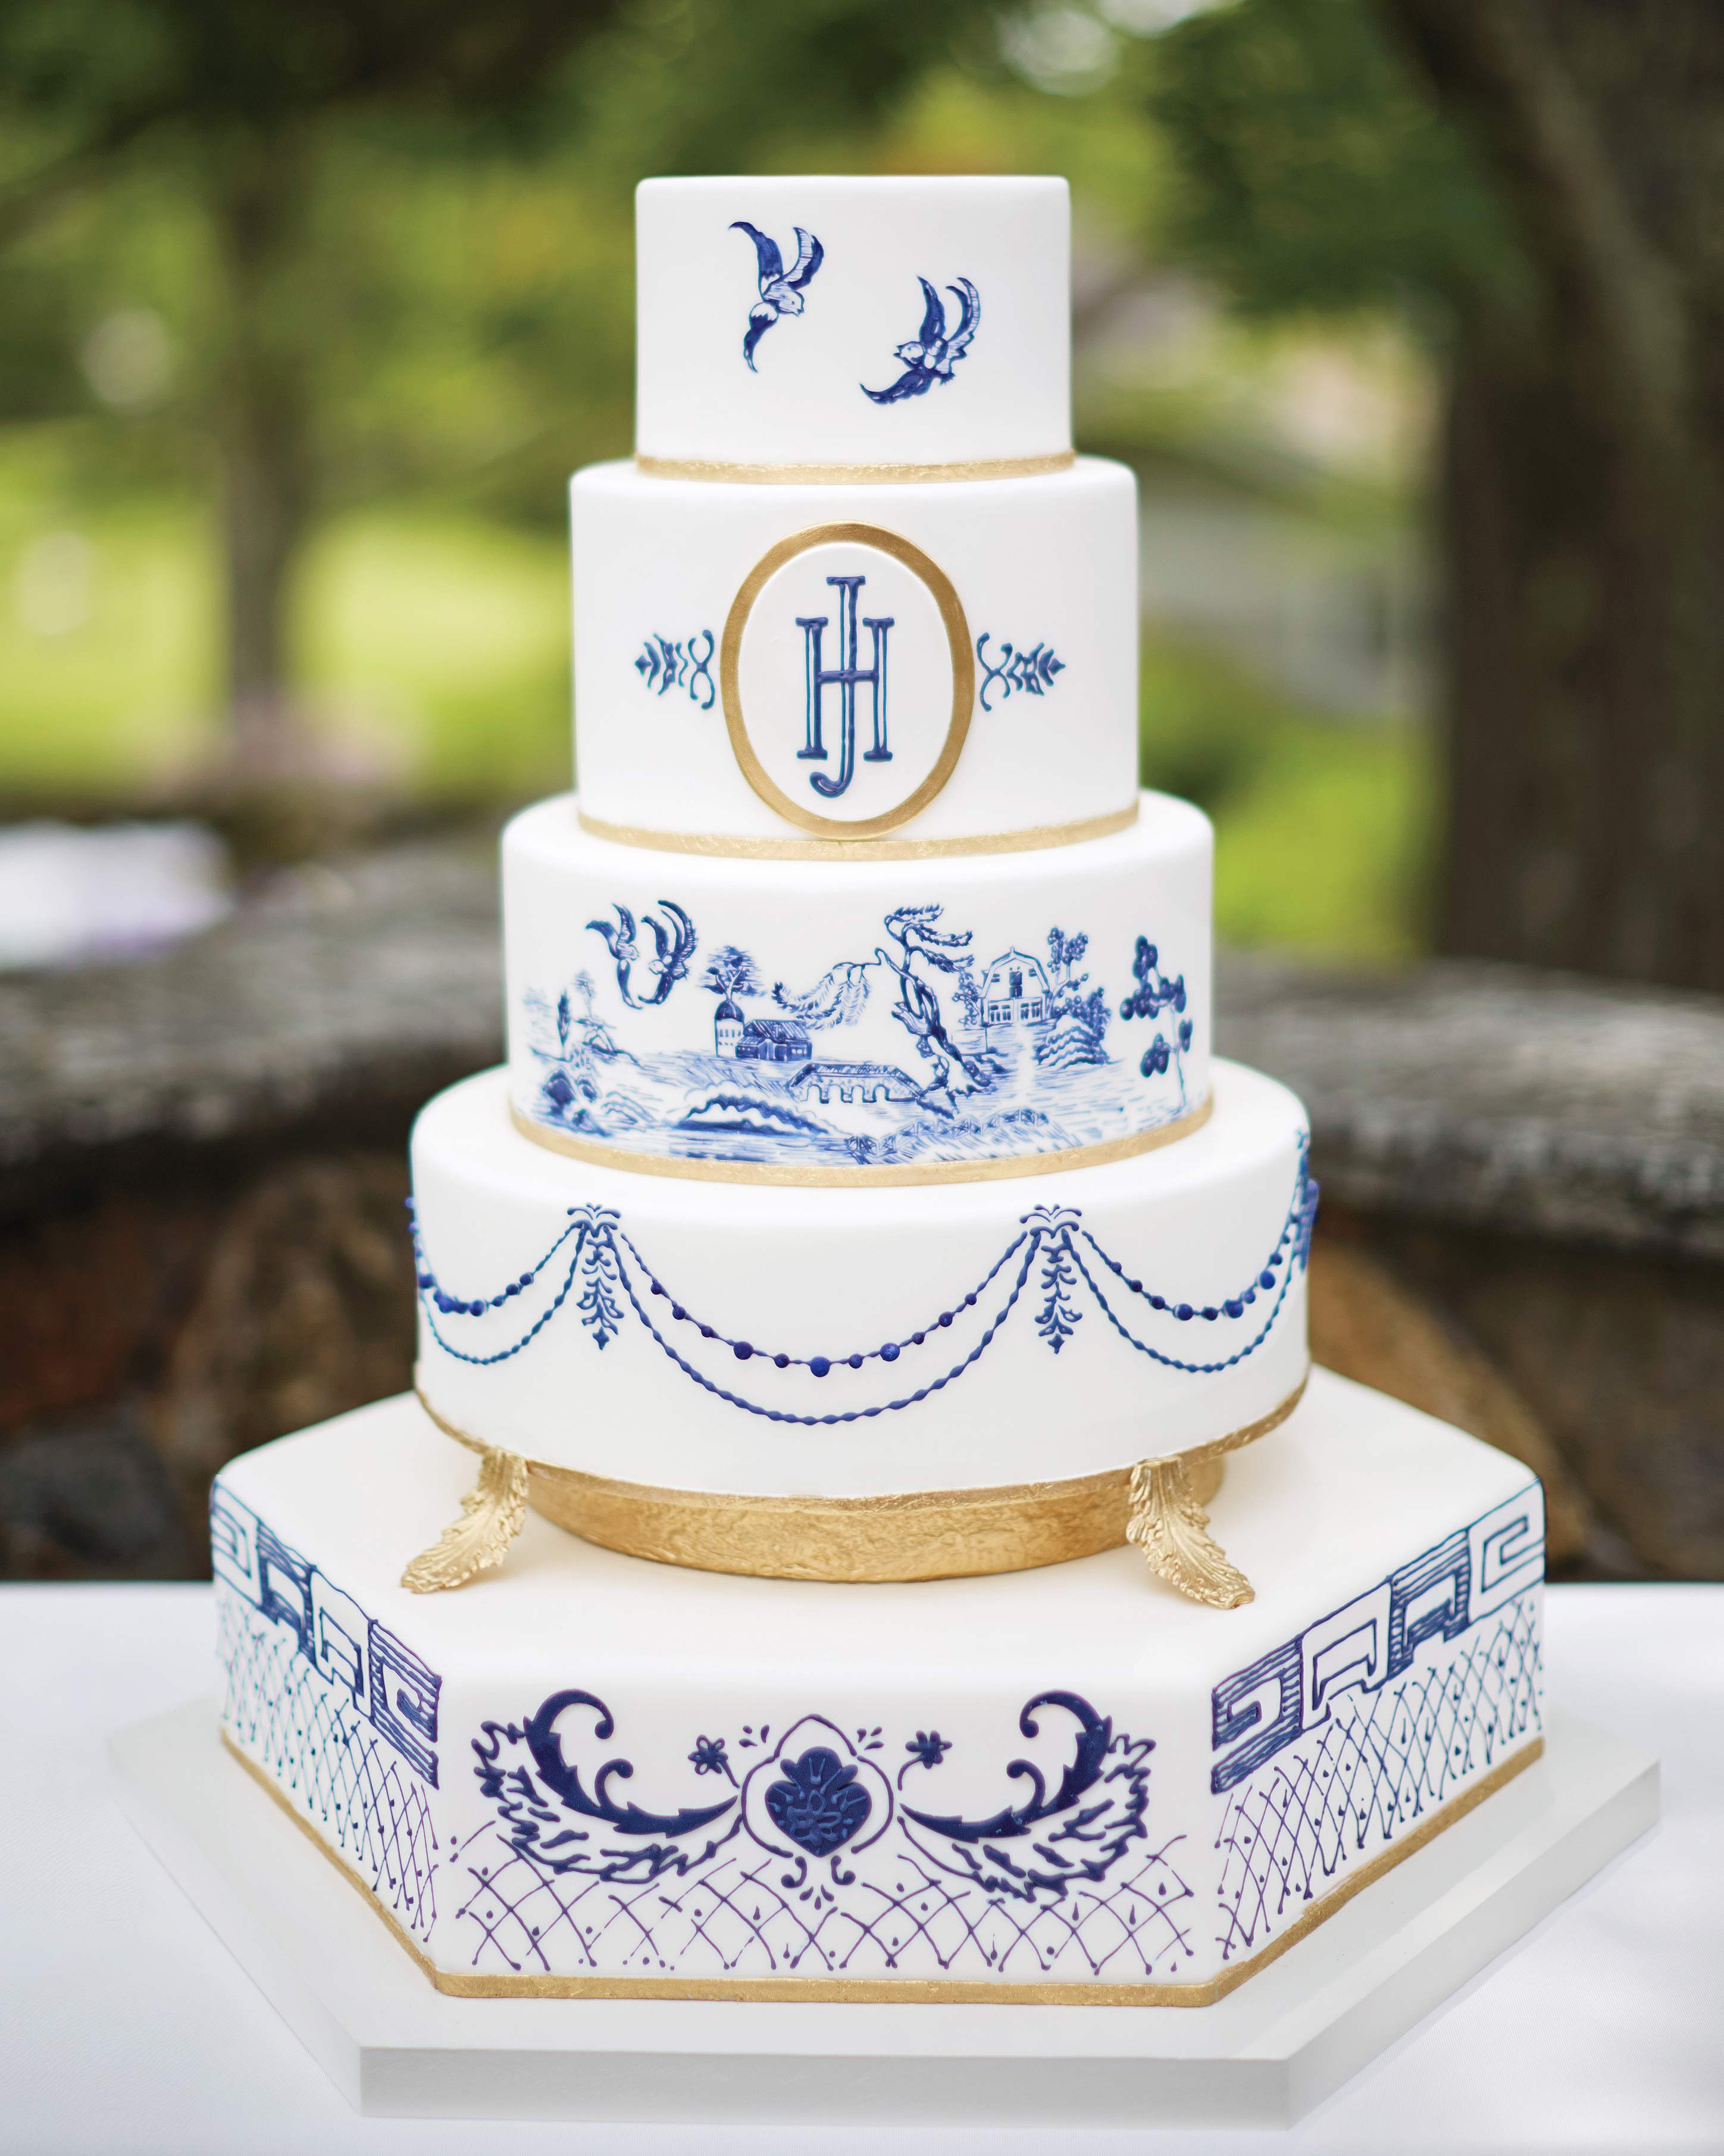 mhonor-jay-wedding-connecticut-elegant-wedding-cake-081-d112238.jpg